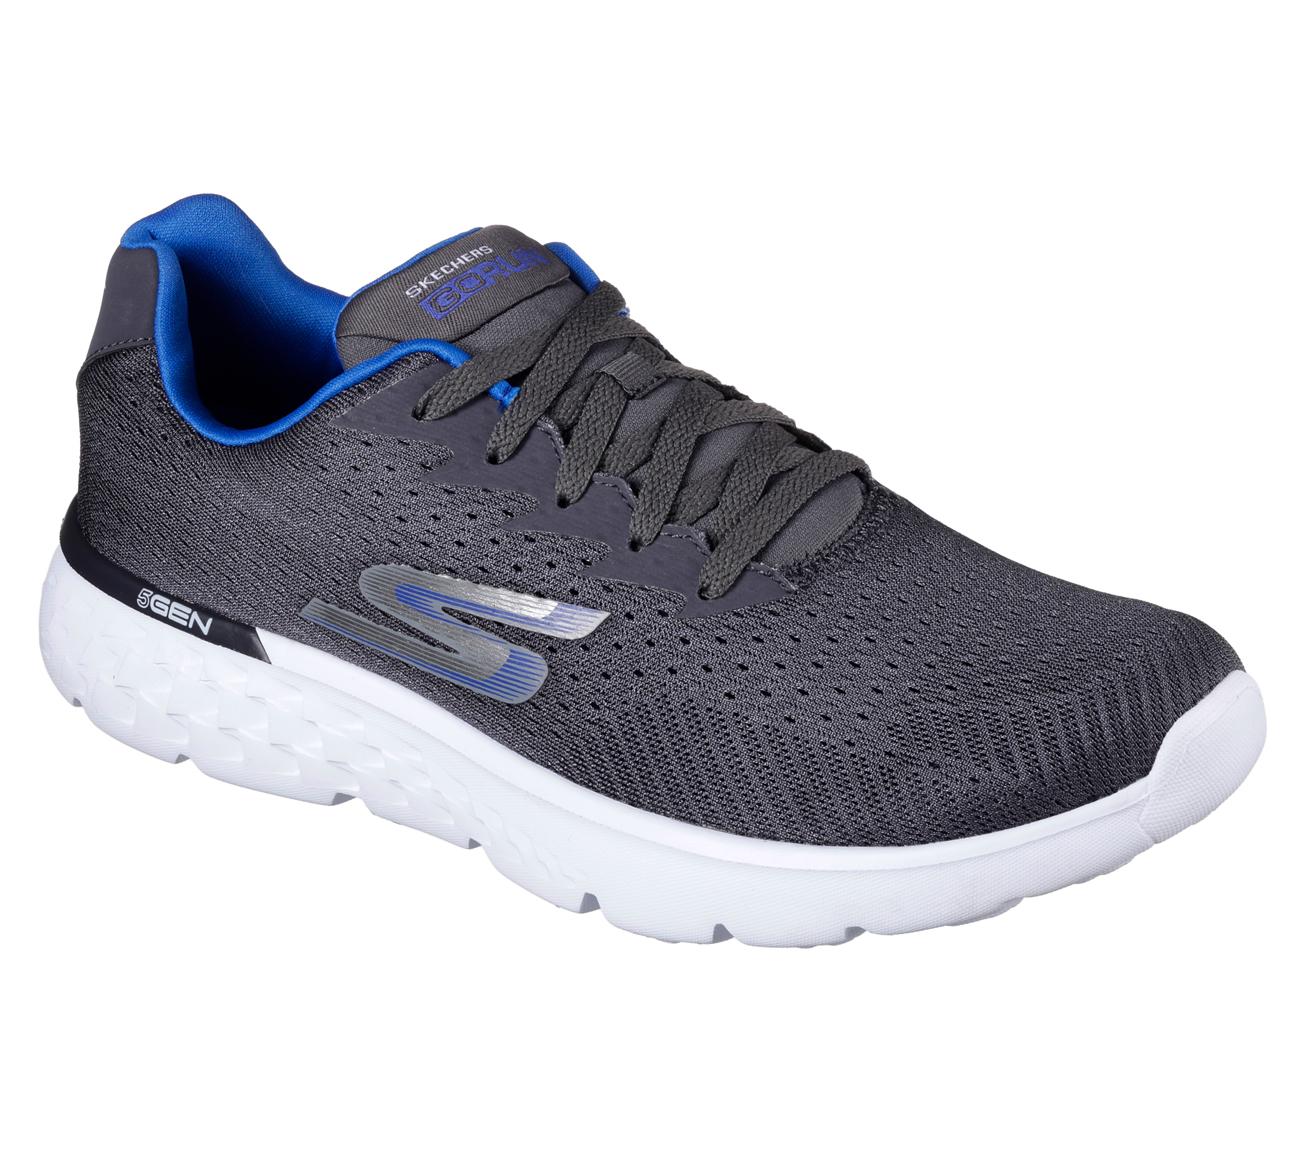 Mens Wide Shoes 4e Images Extra Velcro